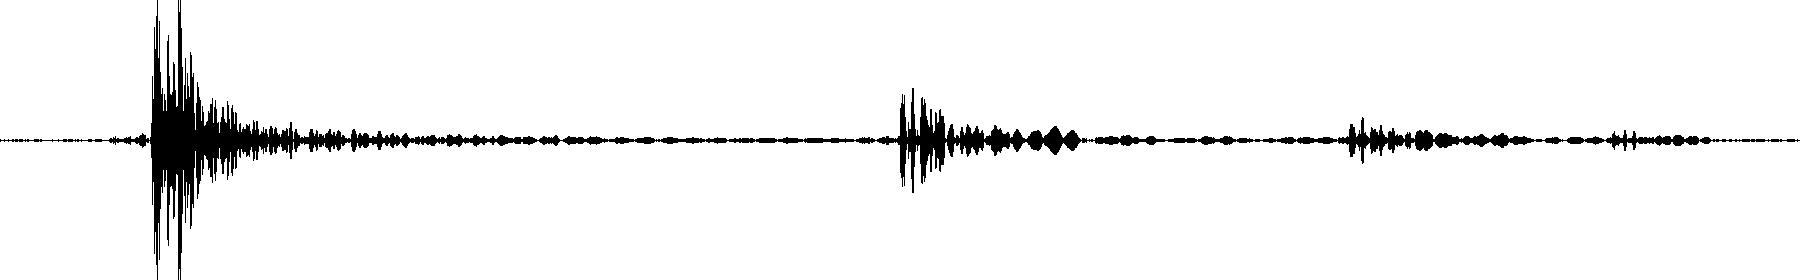 botlerebot1